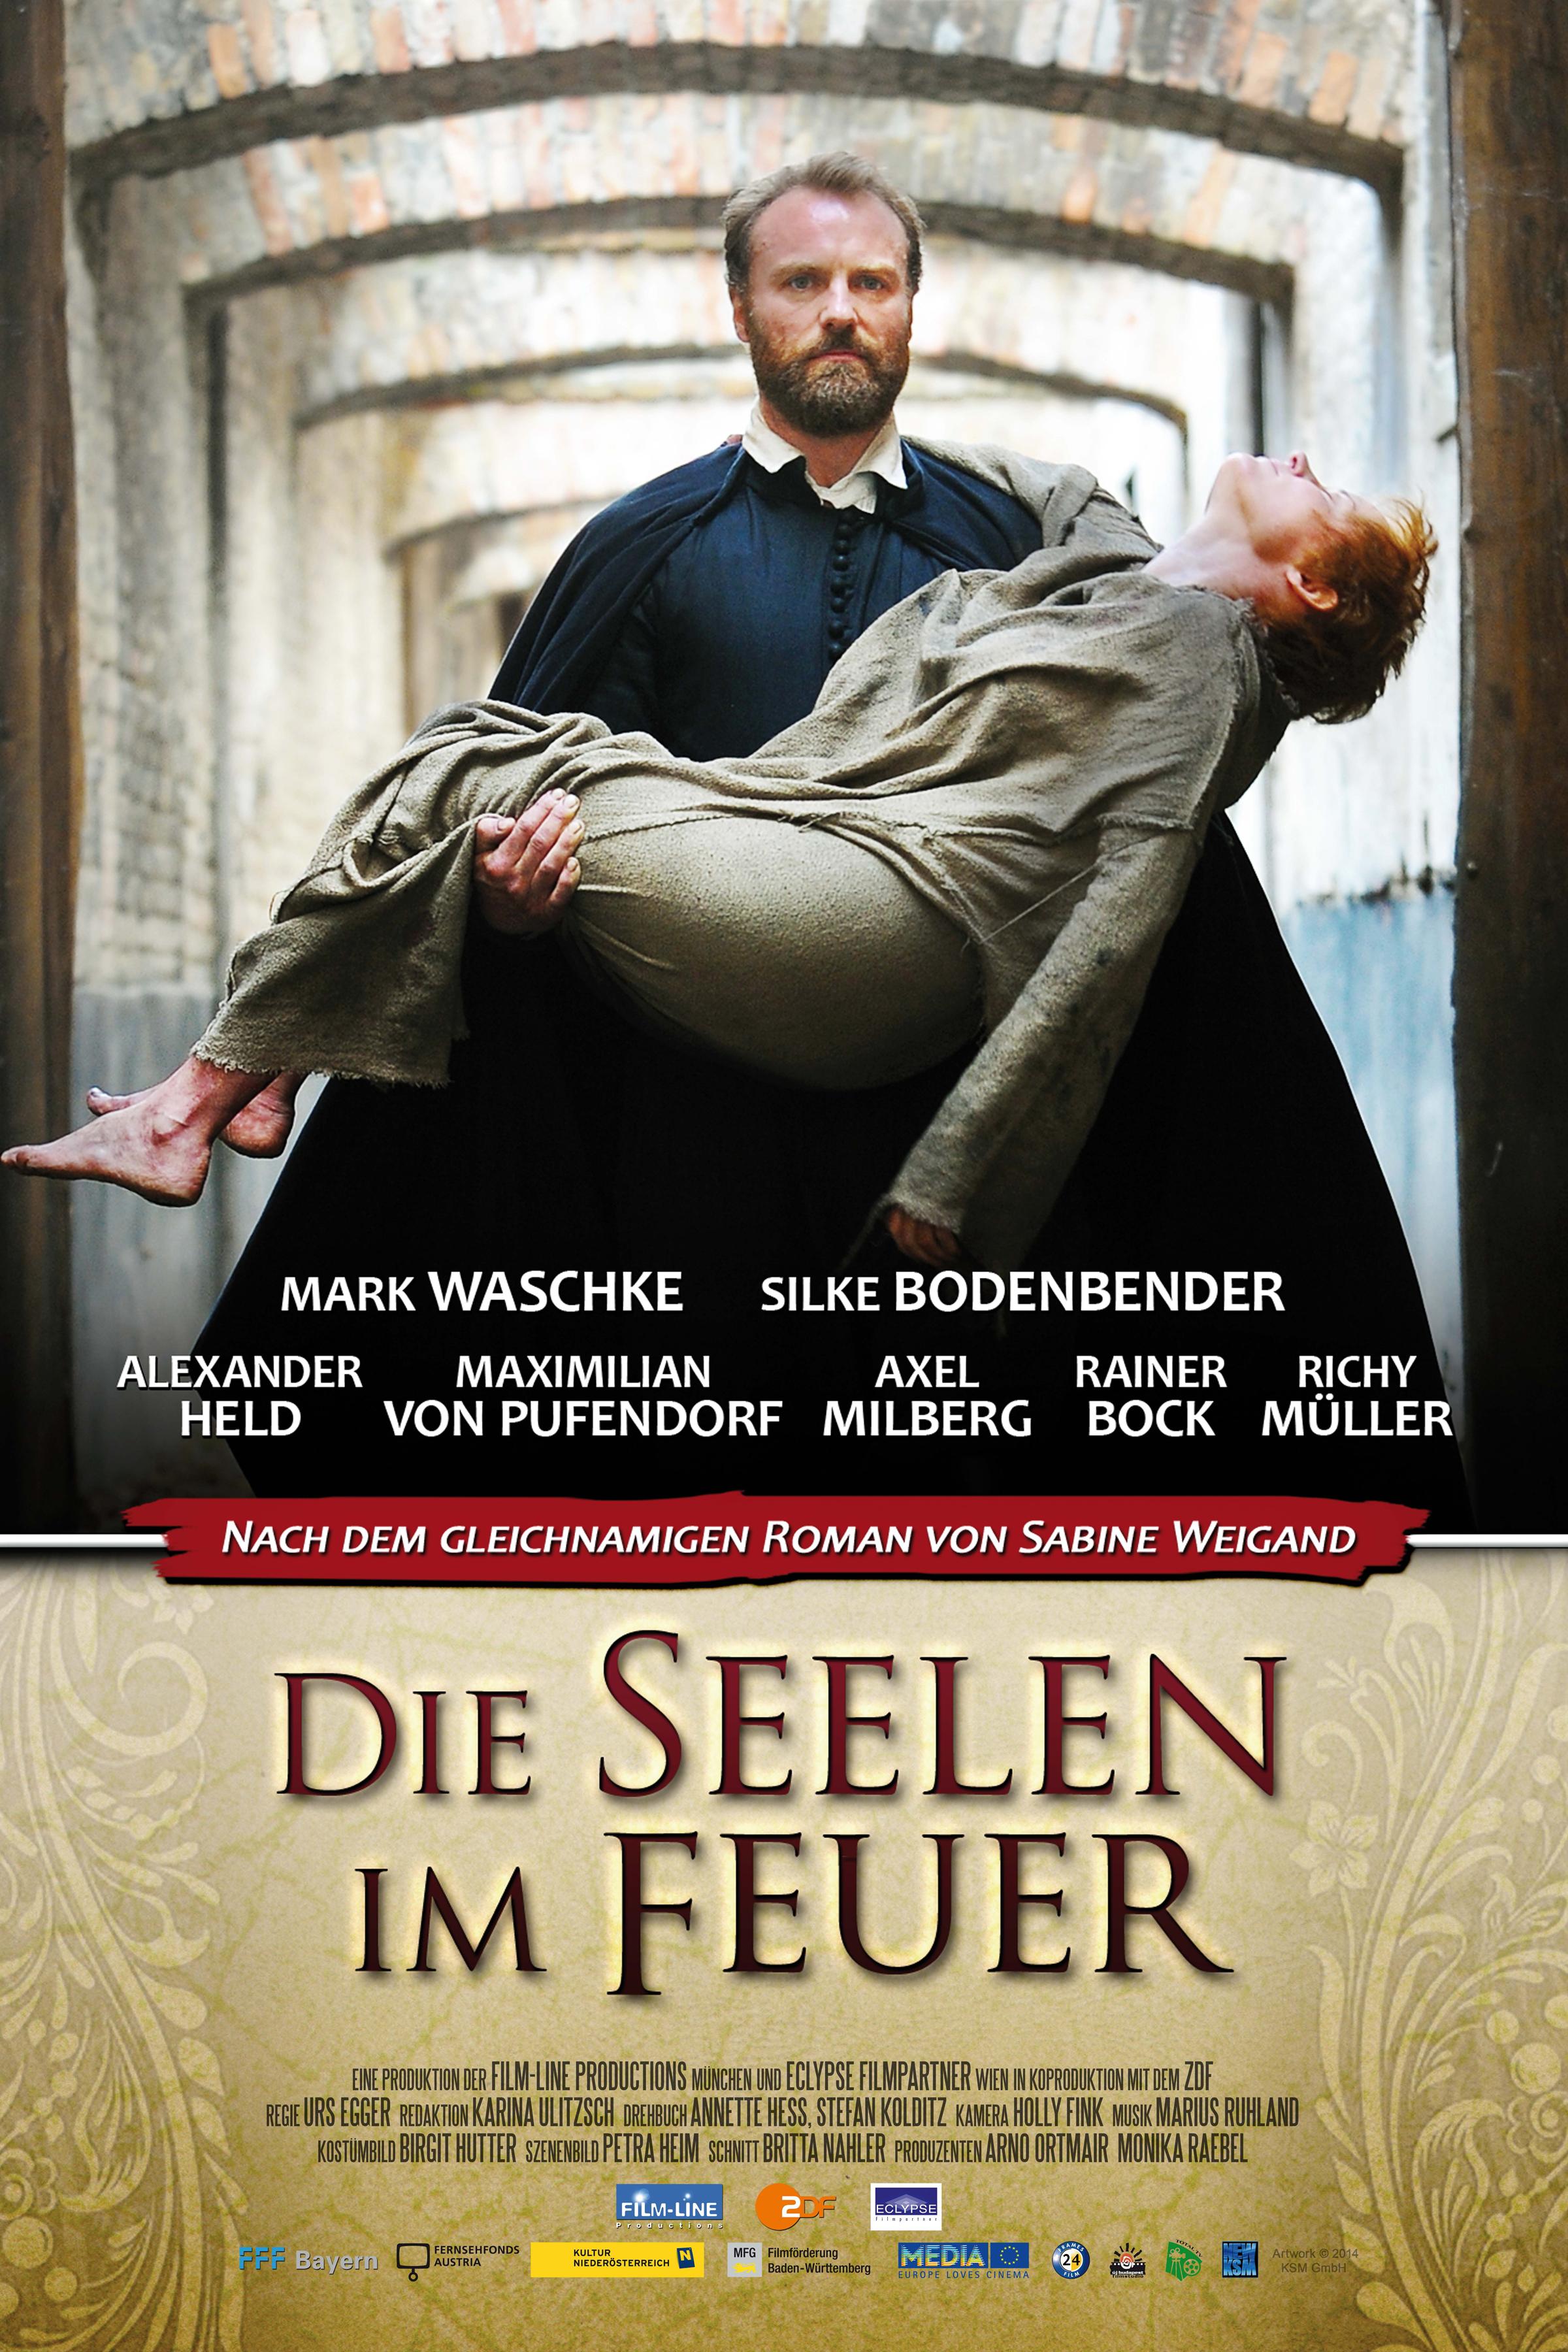 Film-Line_Die Seelen im Feuer - Film-Line.jpg